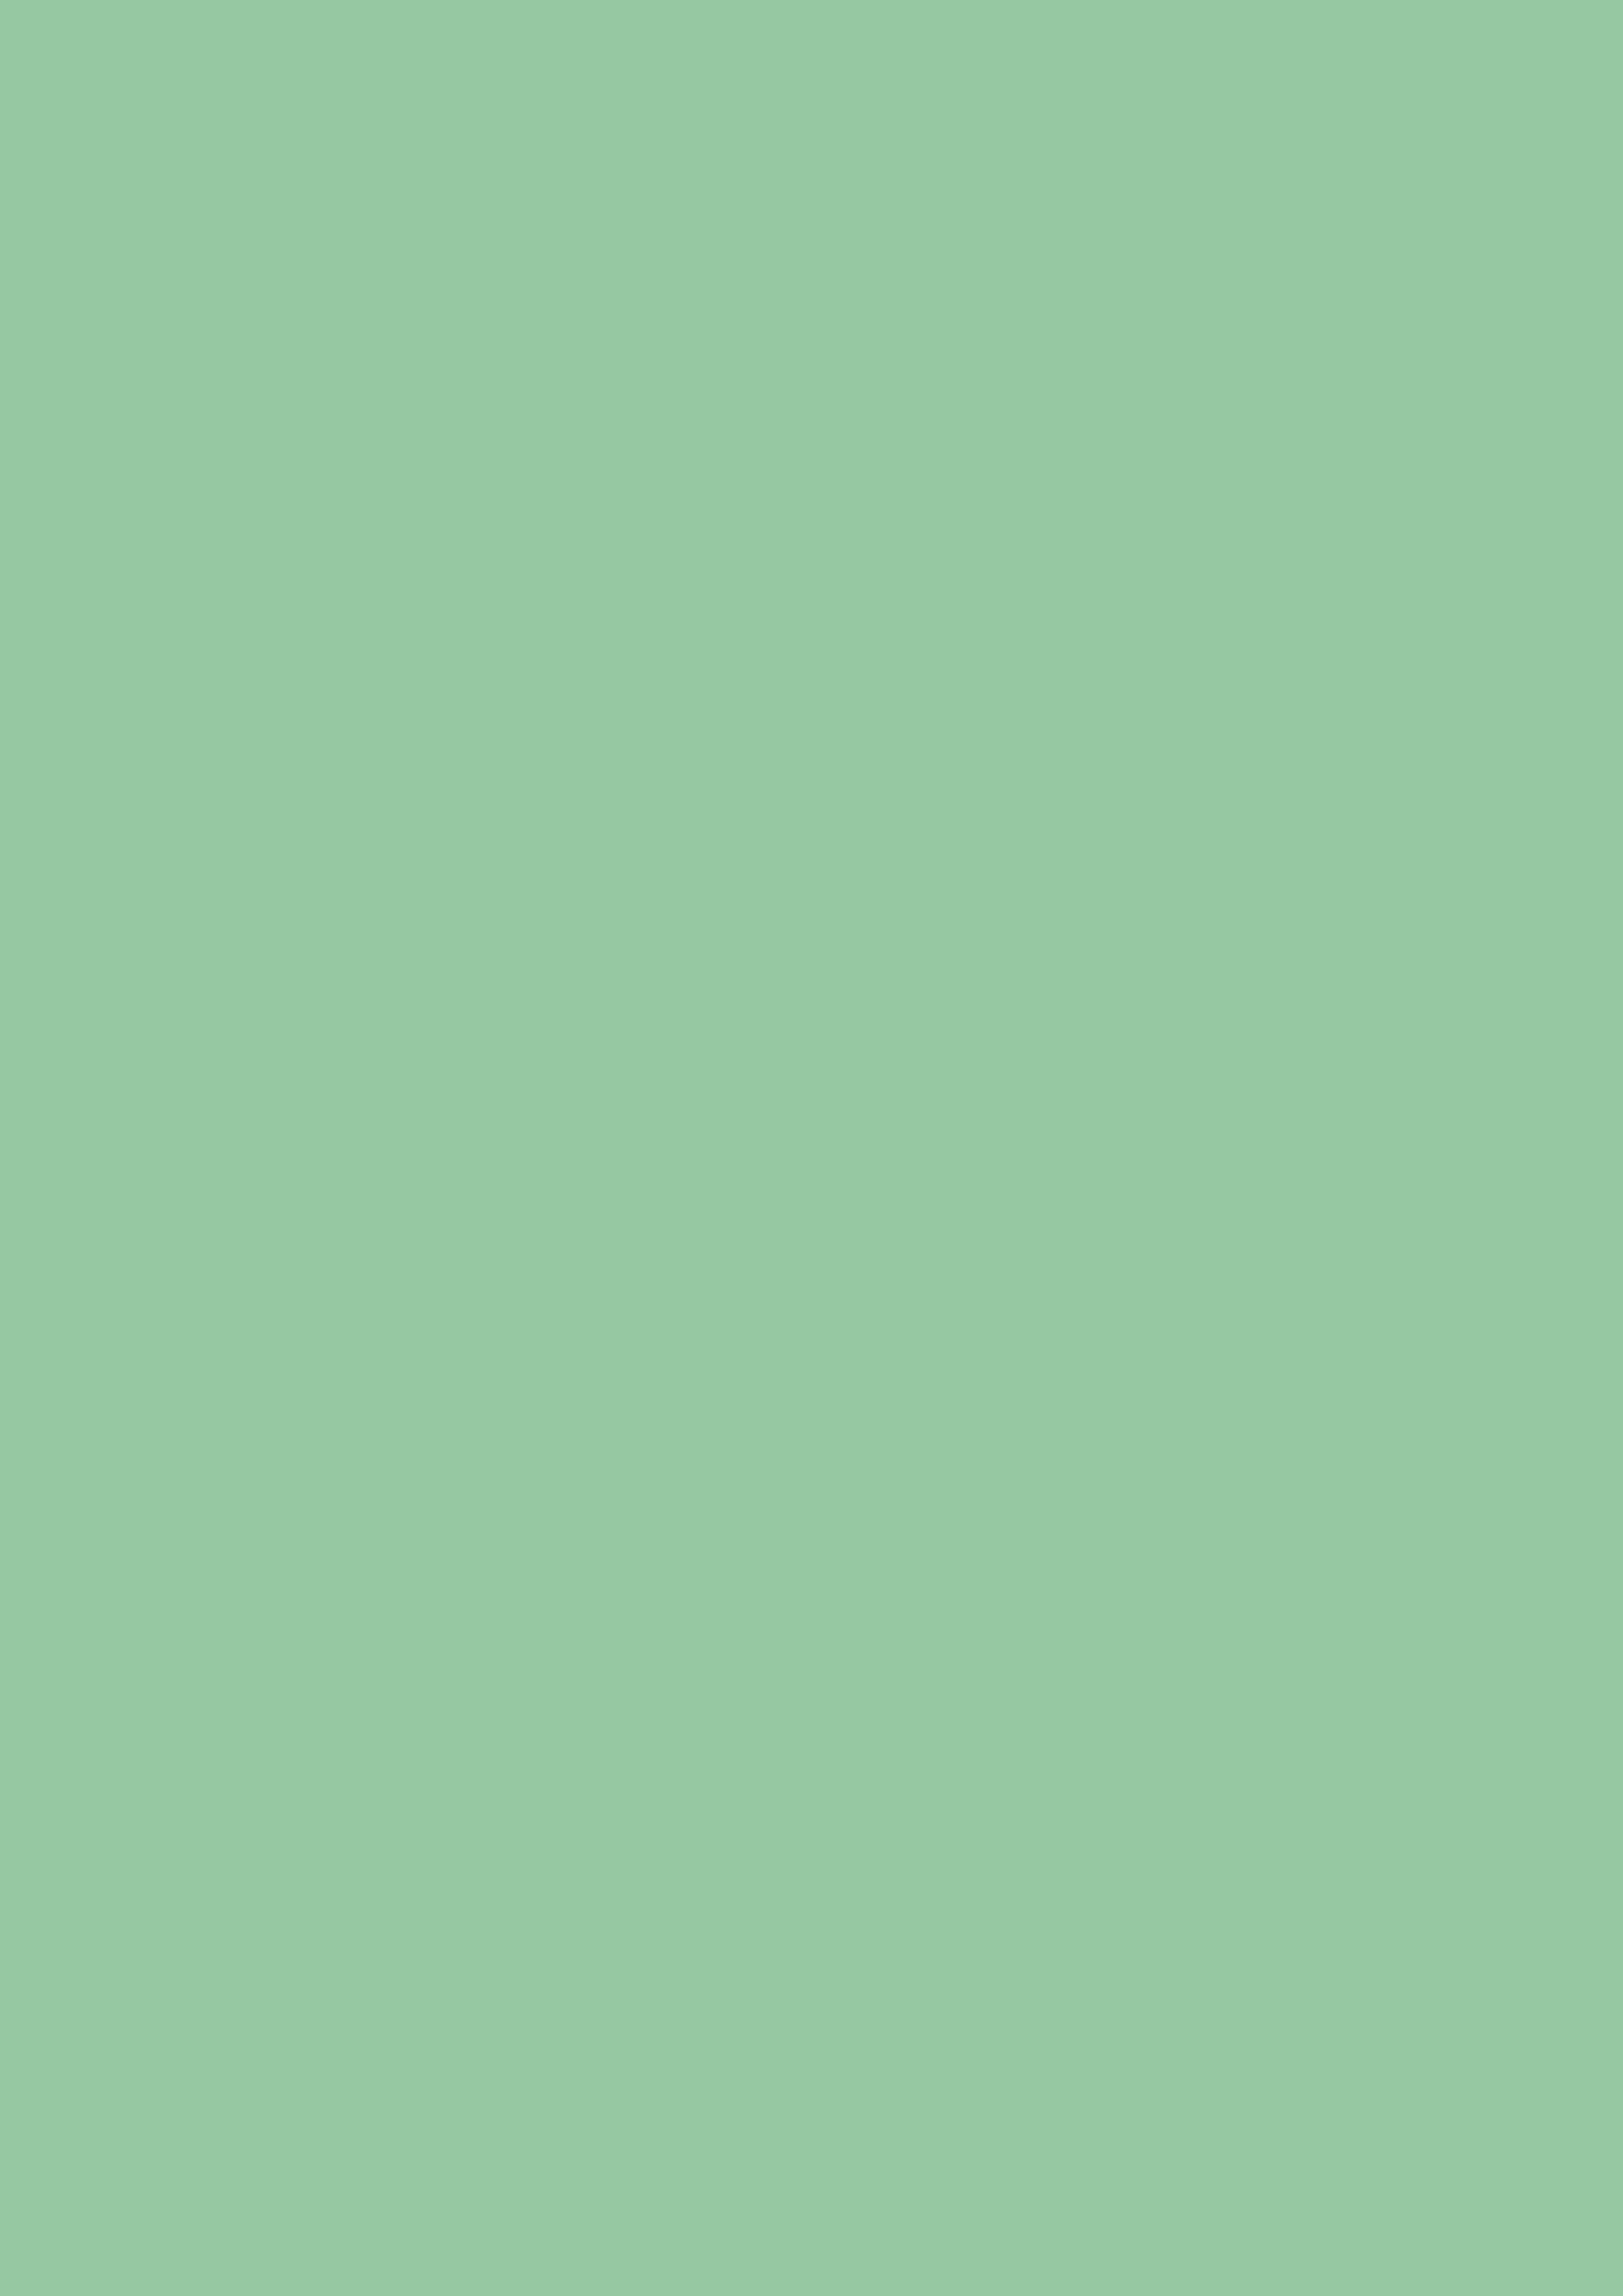 2480x3508 Eton Blue Solid Color Background